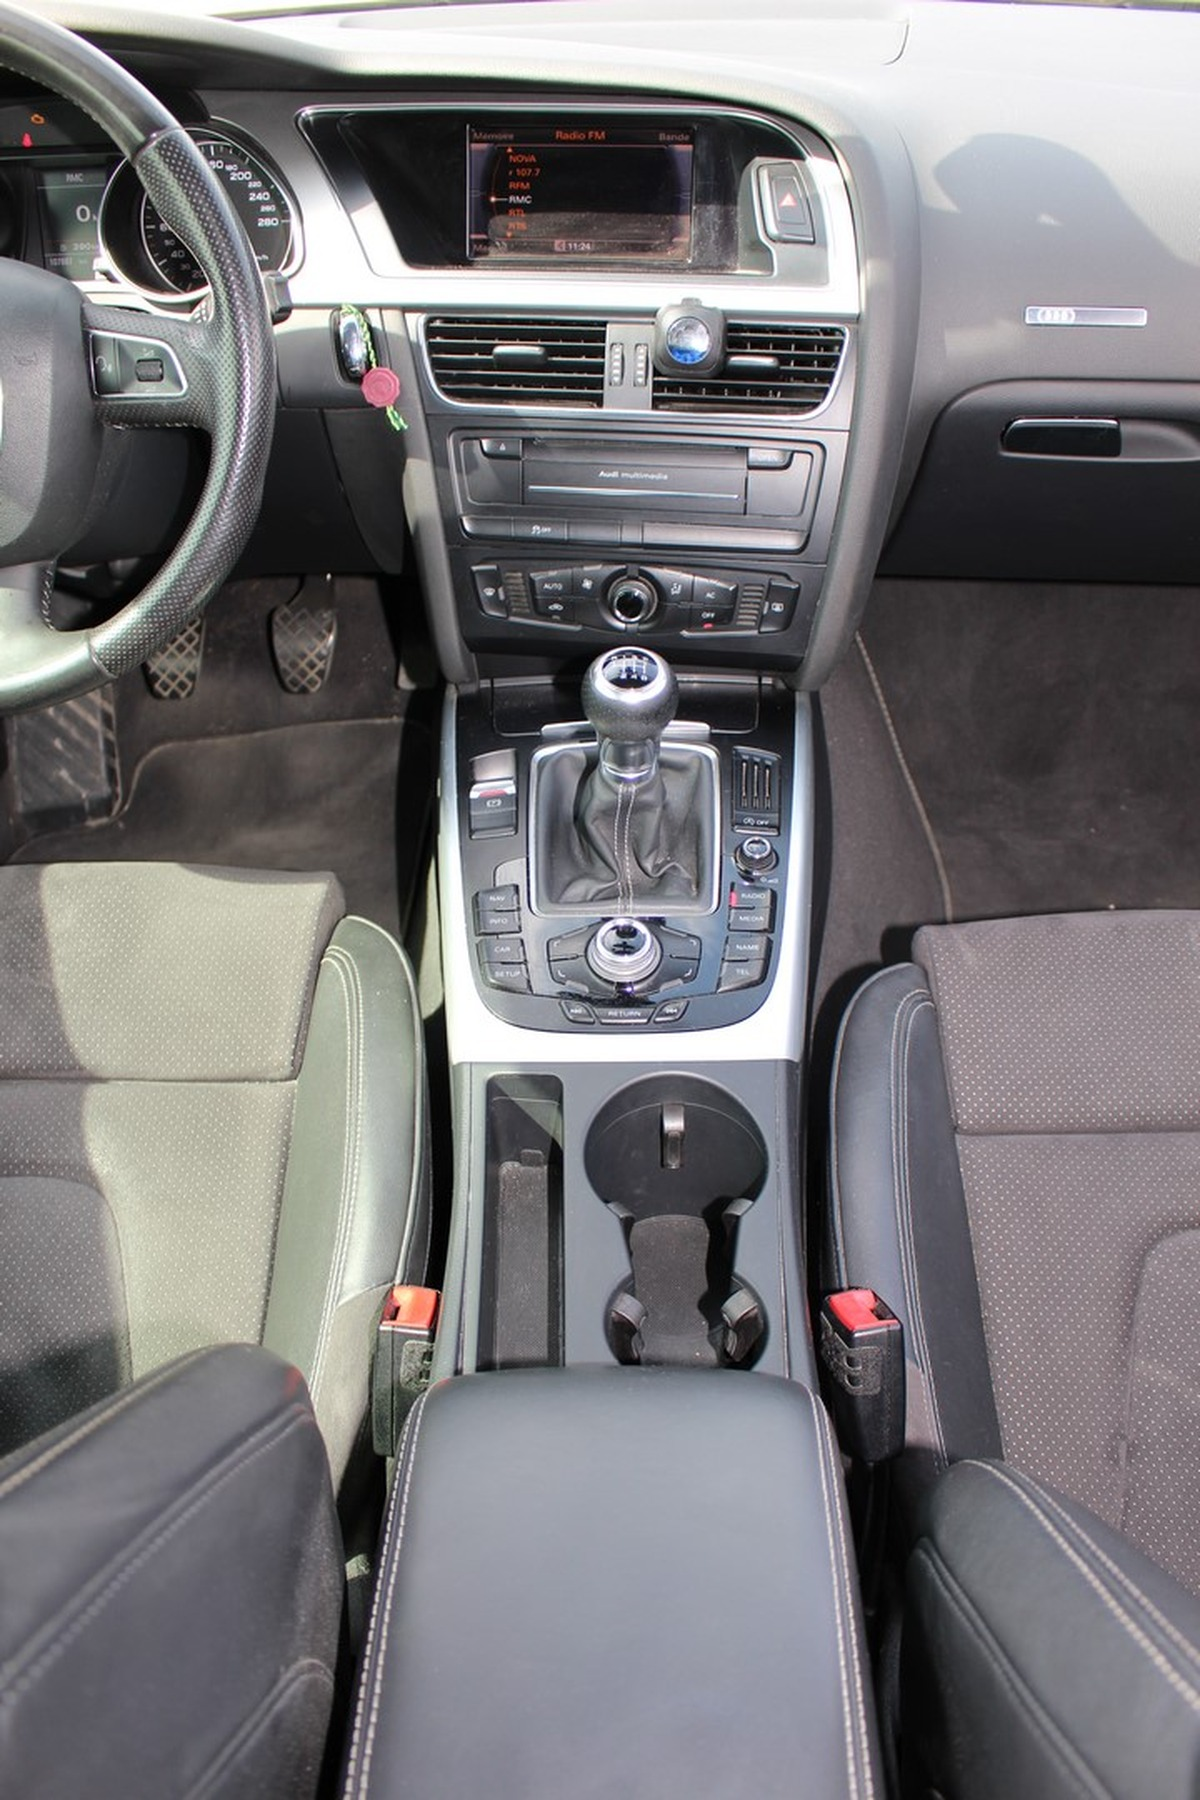 Audi A5 2.0 TDi 170 cv S LINE BLACK EDITION